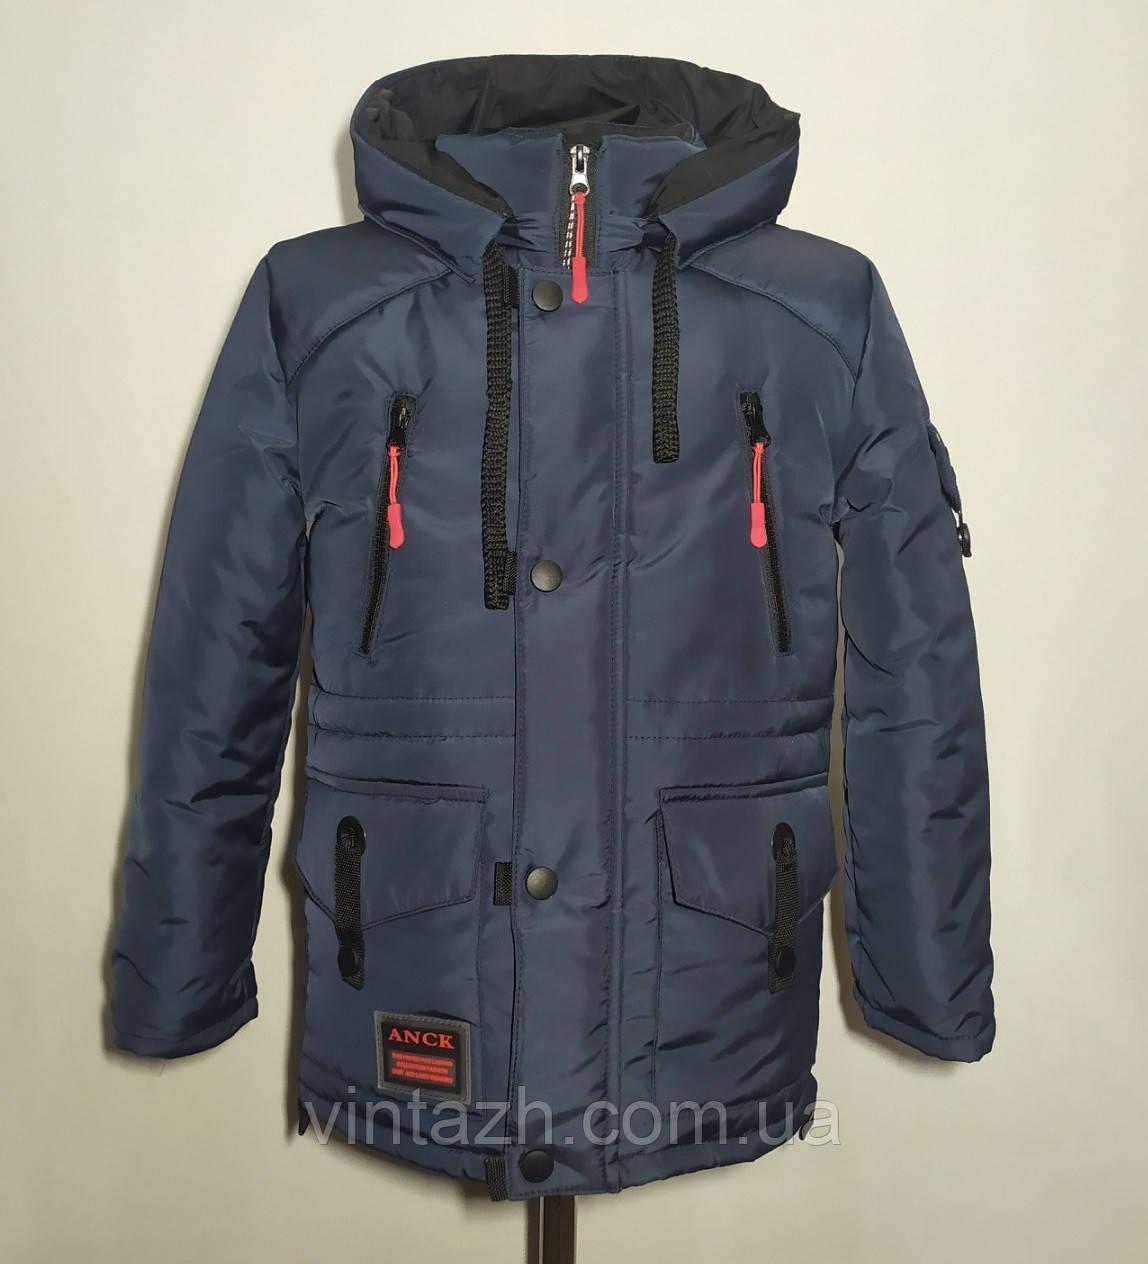 Мальчуковая зимняя теплая куртка рост 98-134